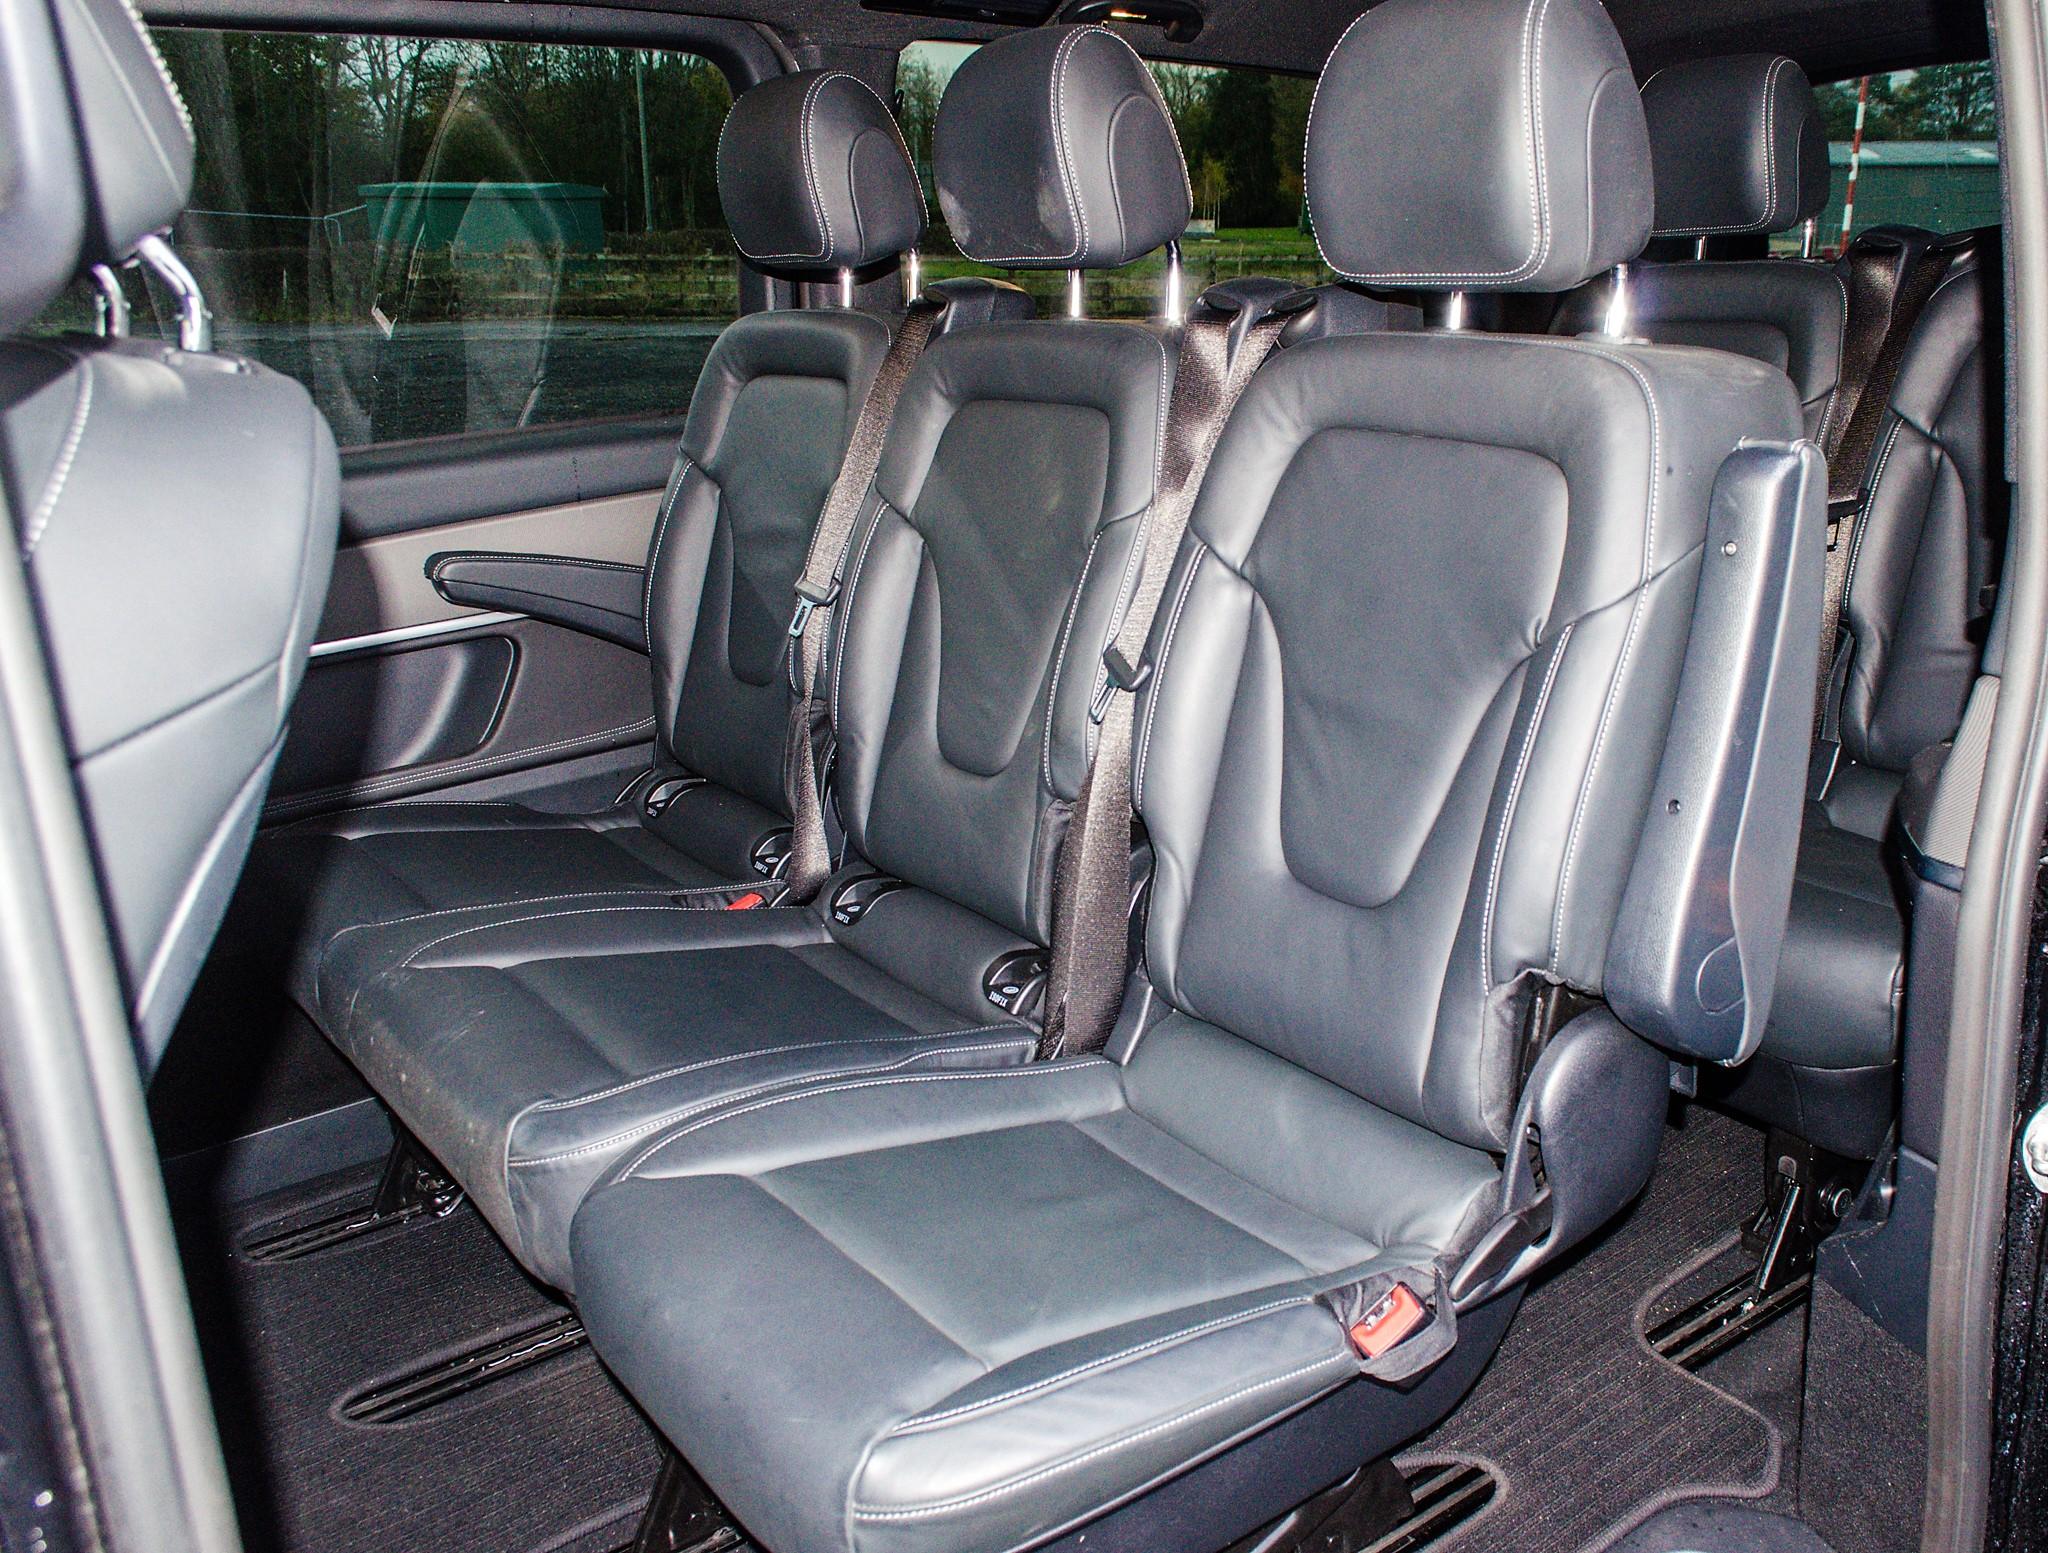 Mercedes Benz V250 Sport Bluetec XLWB auto diesel 8 seat MPV Reg No: FY68 JTO Date of First - Image 18 of 27